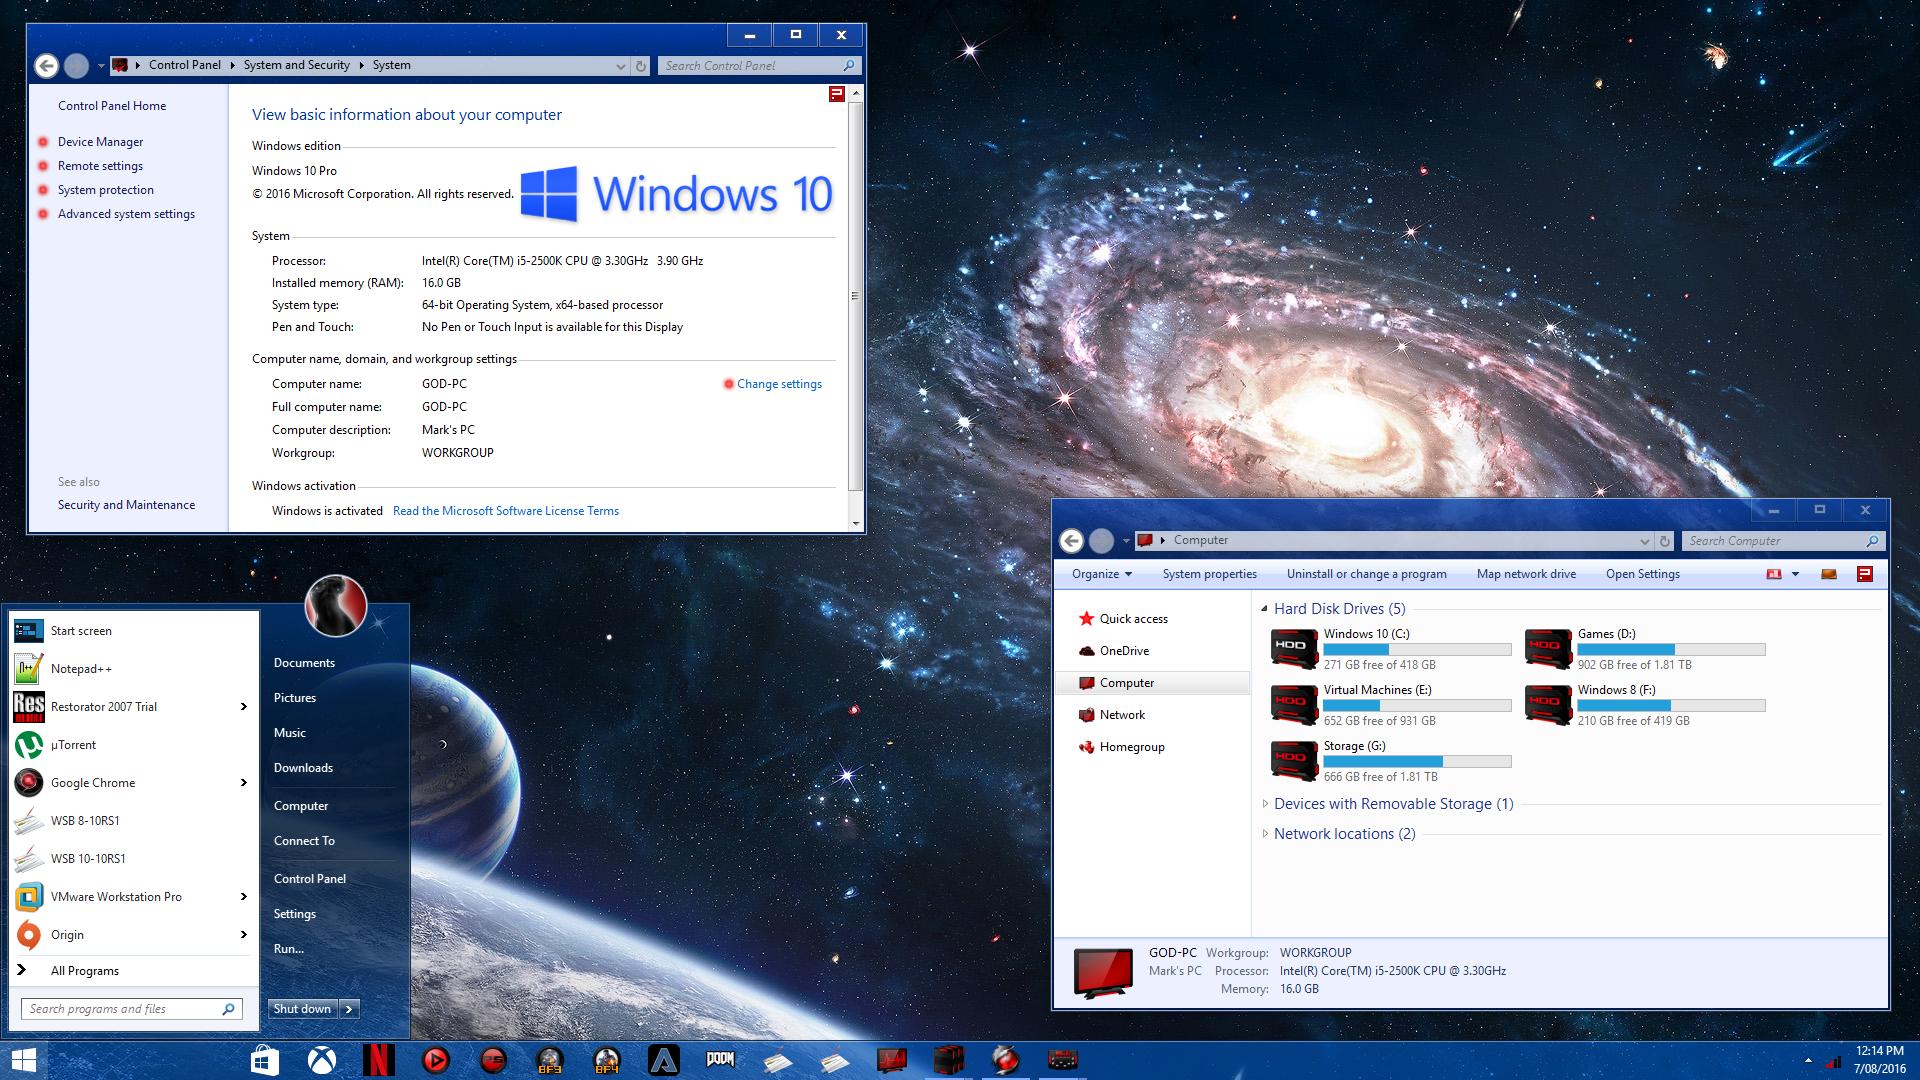 Aero Frost for Windows 10 Build 1903-21h2